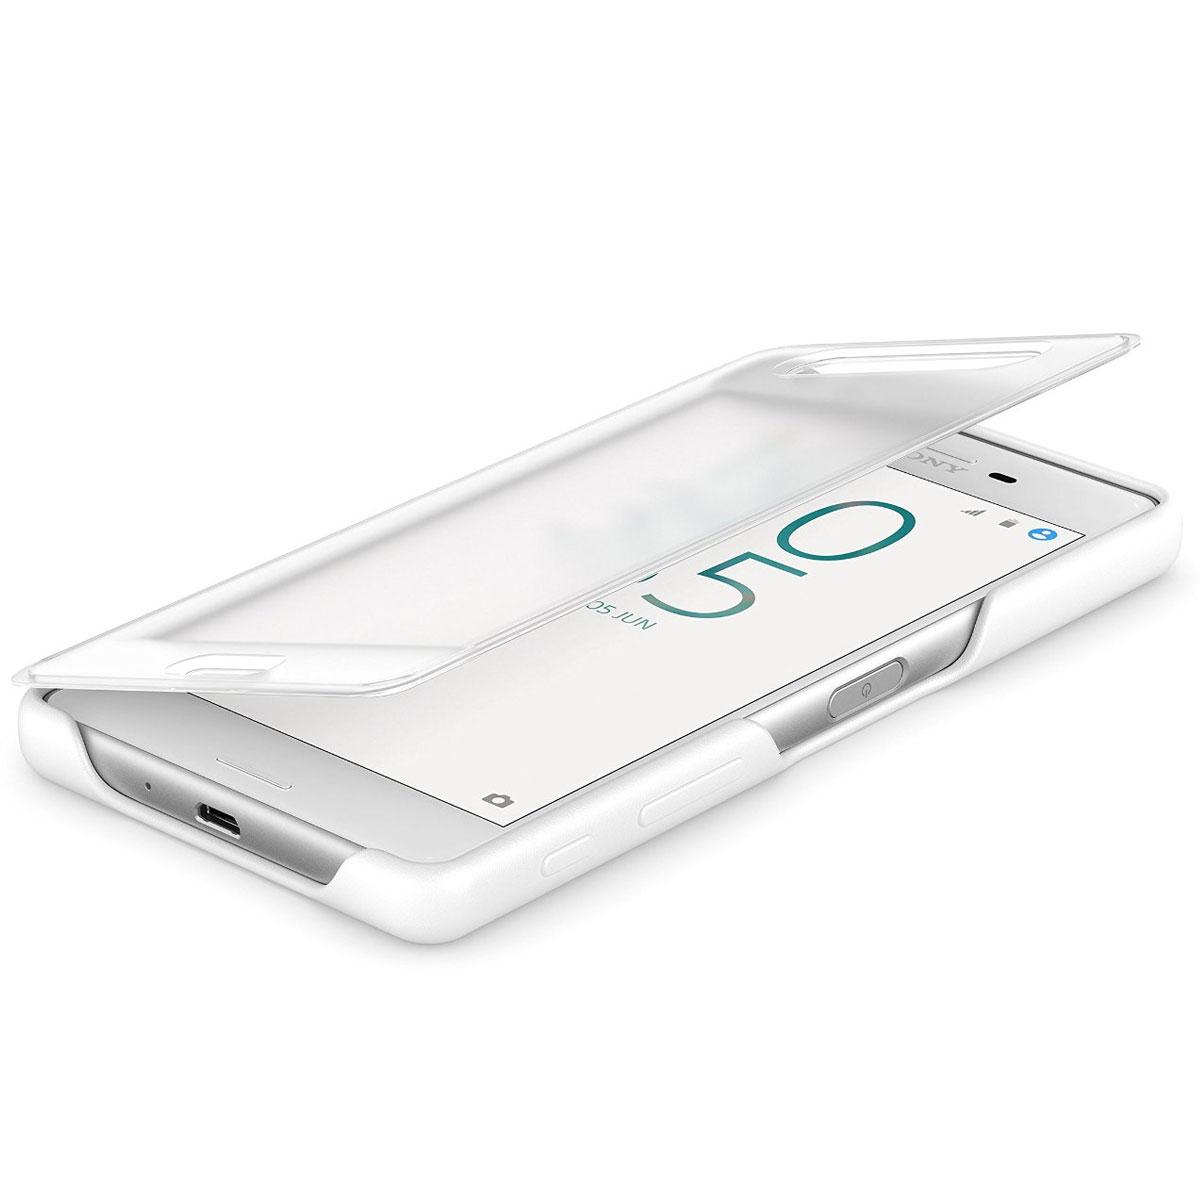 Coque Smartphone Sony Etui Flip Cover Blanc Pour Sony Xperia X GEqBnHIVZD